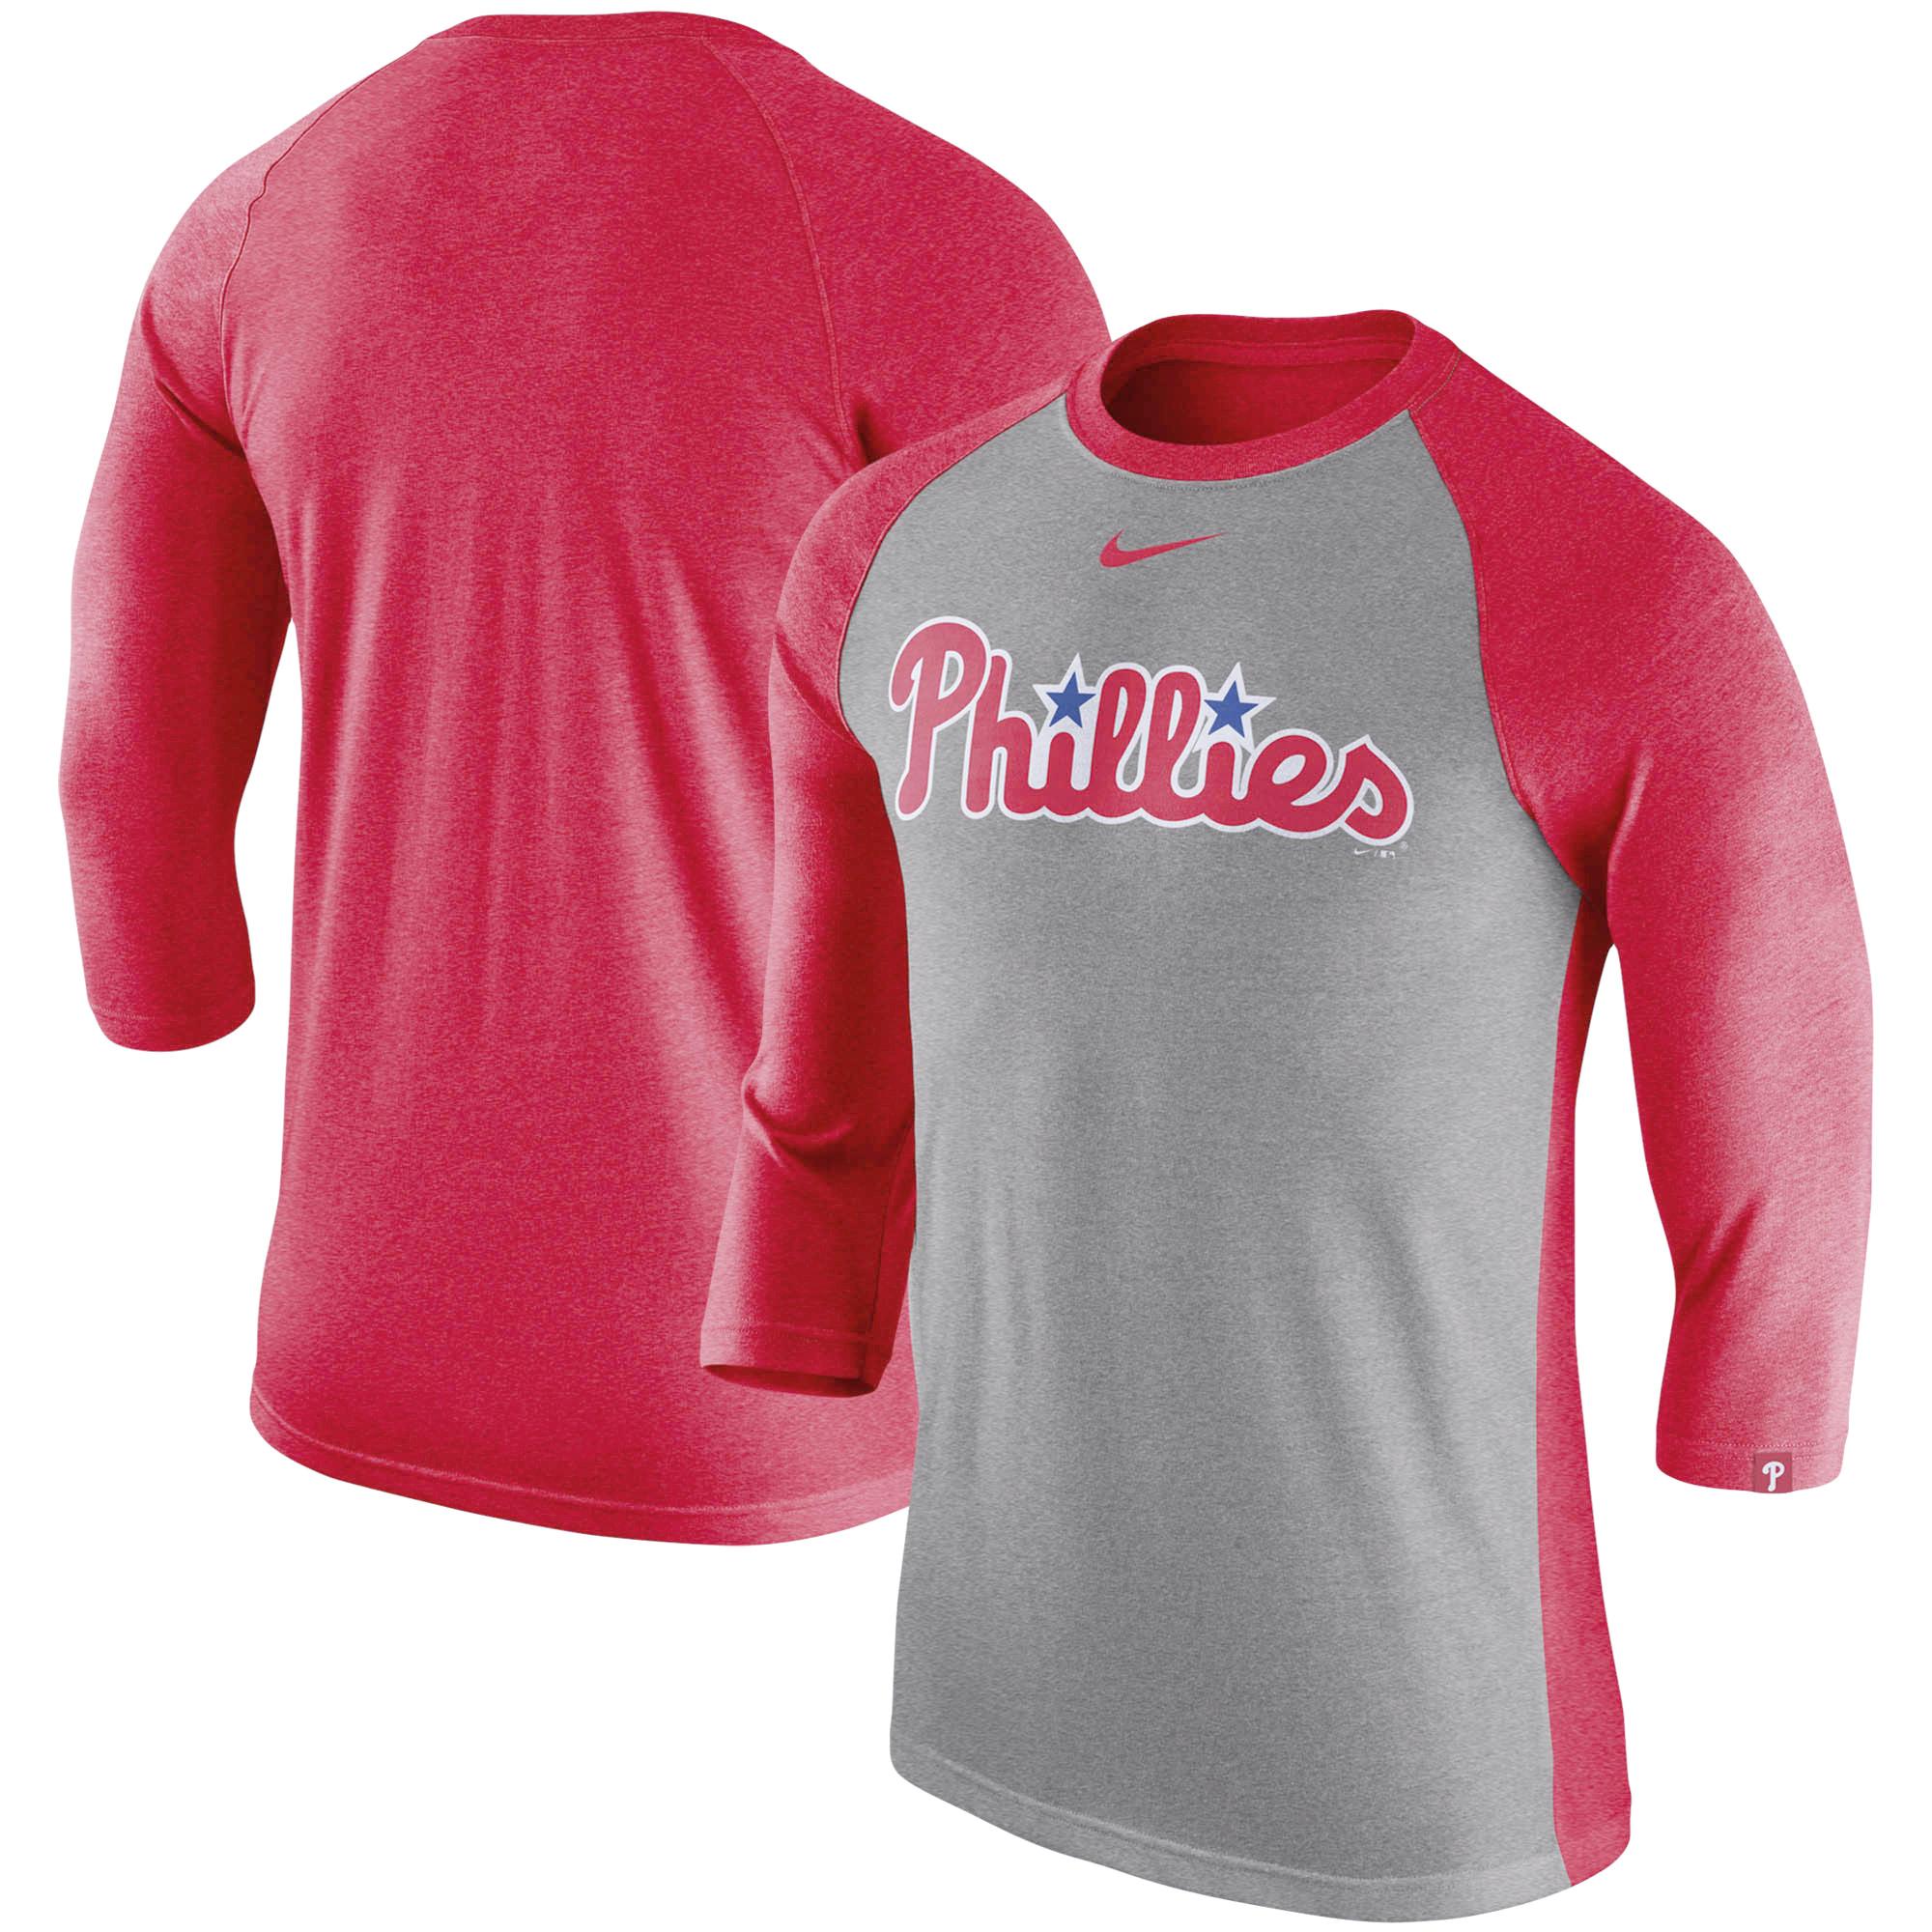 Philadelphia Phillies Nike 3/4-Sleeve Raglan T-Shirt - Gray